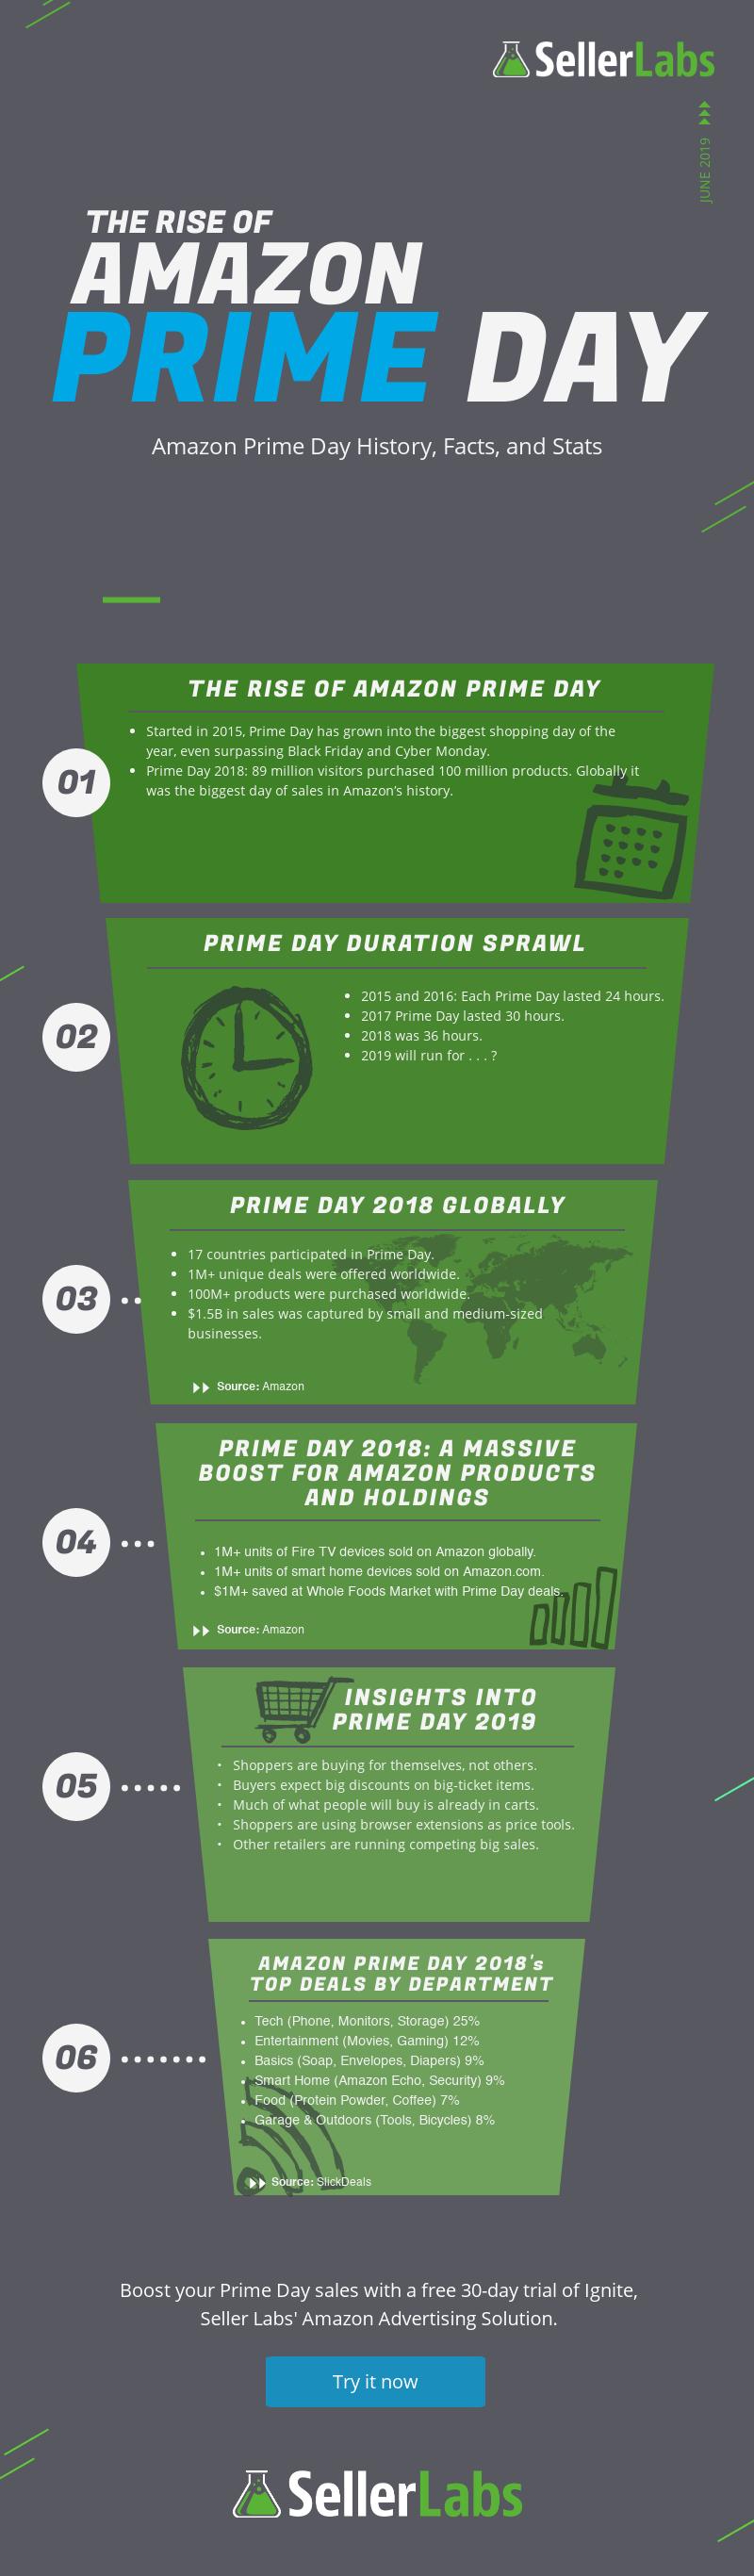 Rise of Amazon Prime Day